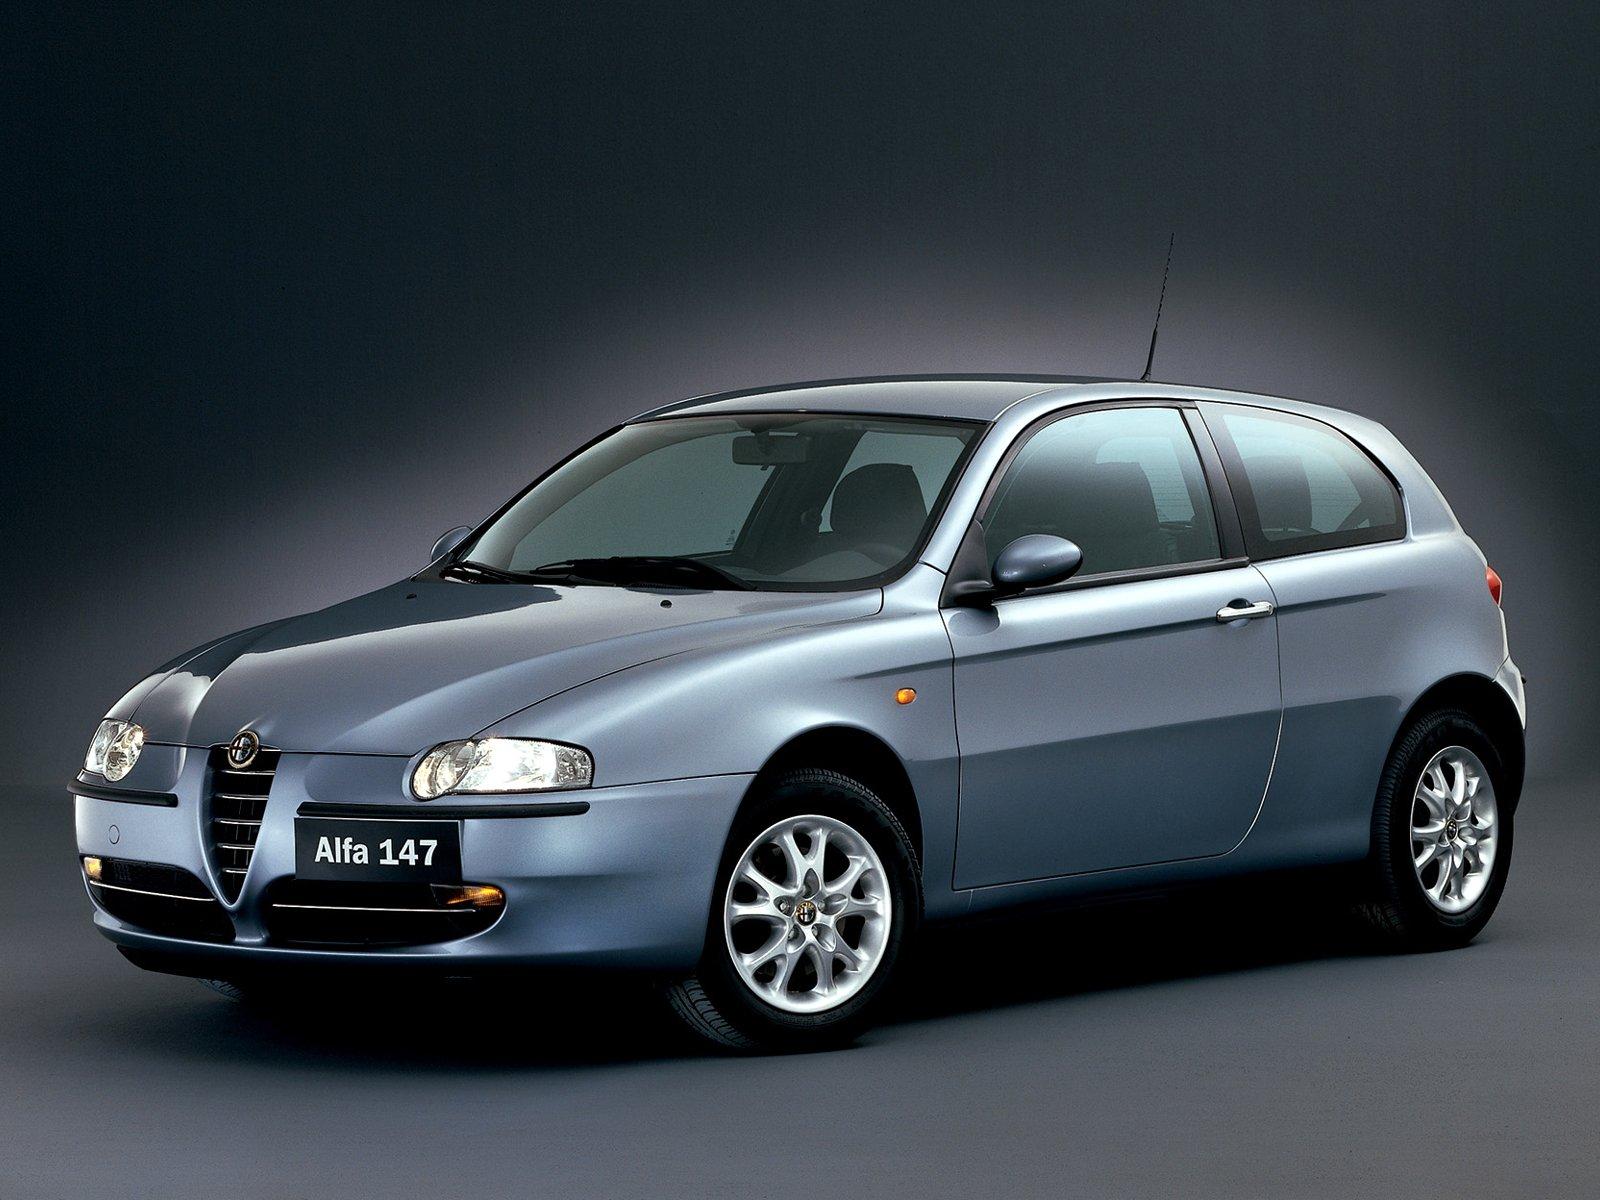 ALFA ROMEO 147 (3 Doors) specs - 2000, 2001, 2002, 2003 ... |Old Alfa Romeo 147